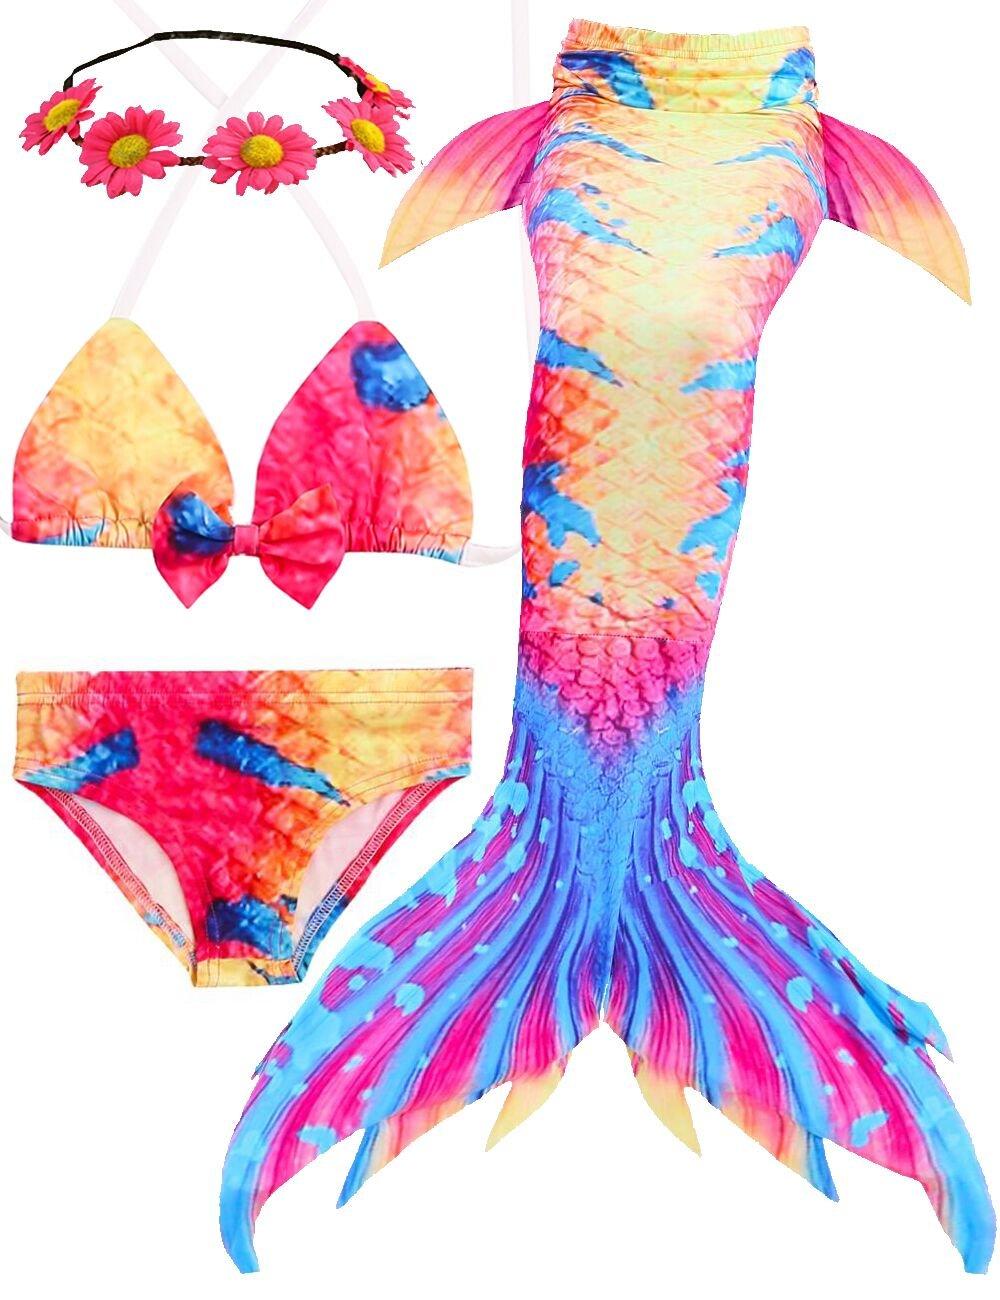 ff000d1b7d5cb Galleon - Jeferym 4PCS Girls Swimsuits Mermaid Tail For Swimming Bikini Set Toddler  Big Girl 3-14Y A Rainbow 5-6 Years Medium